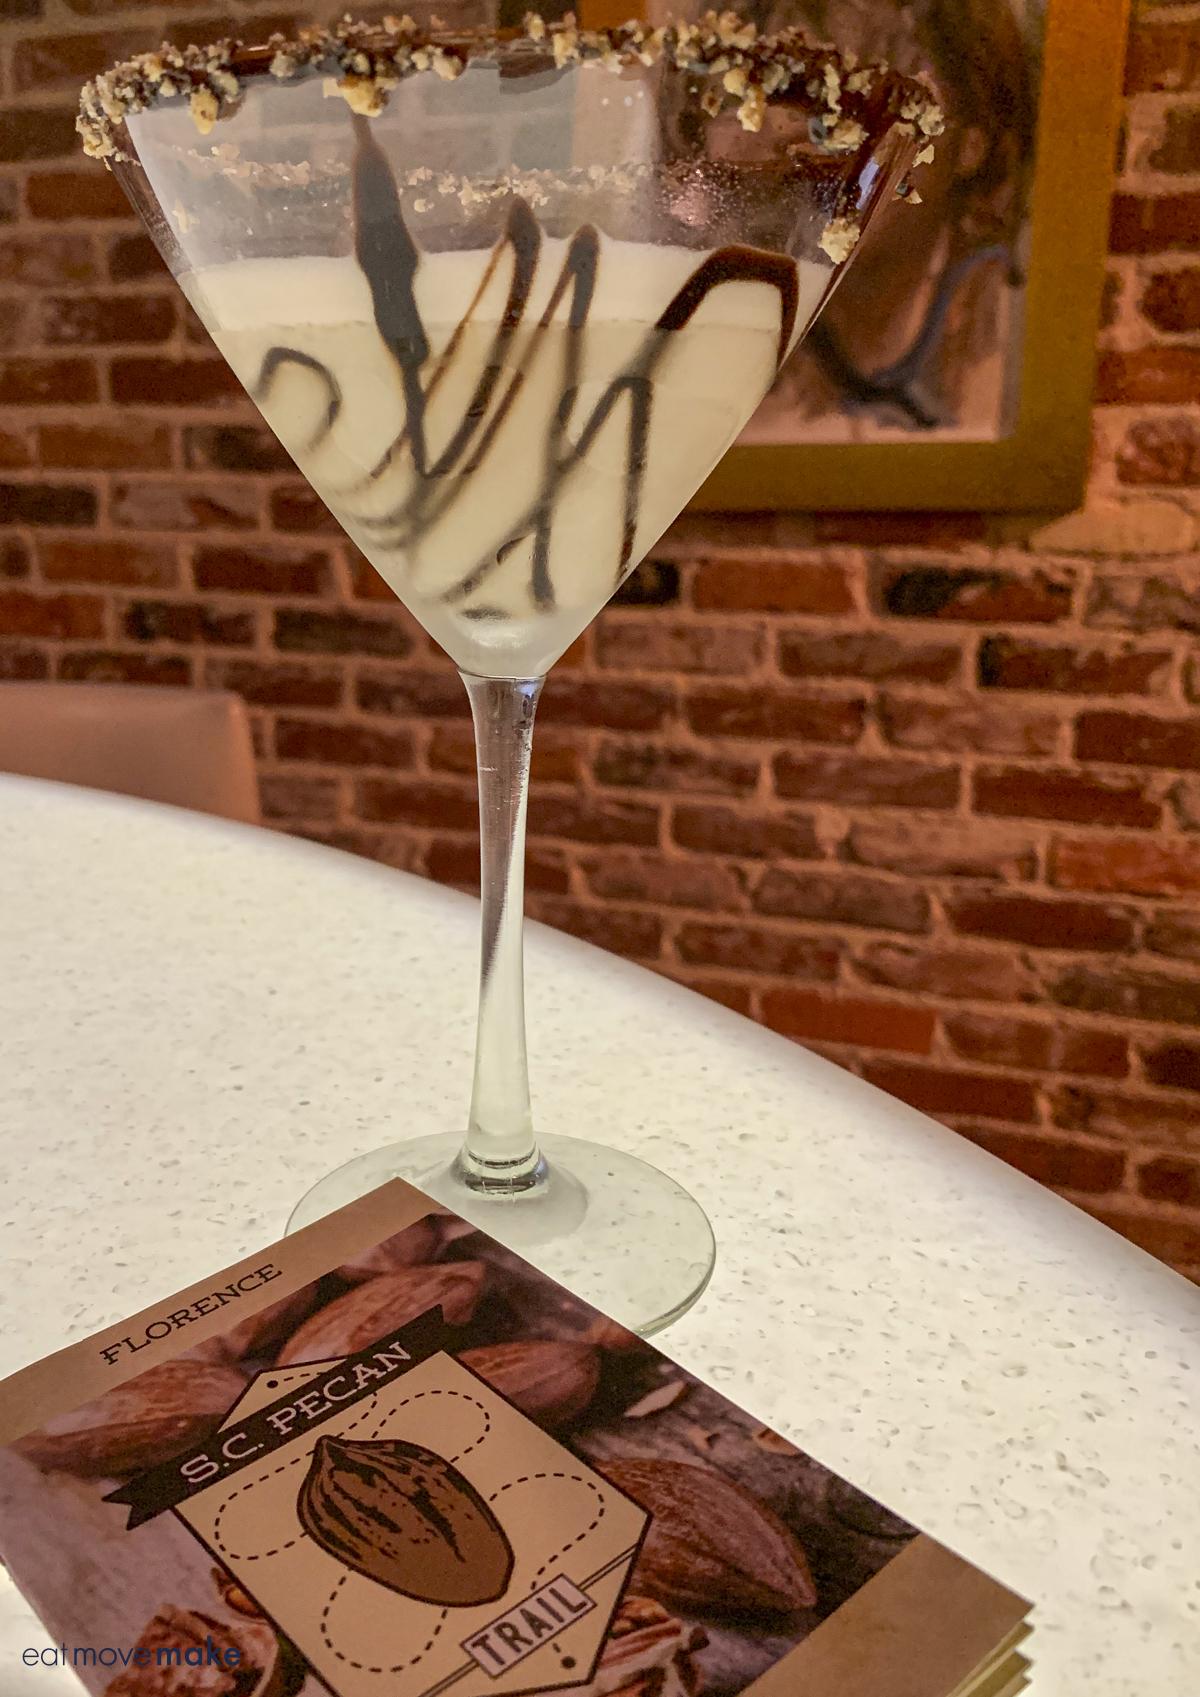 pecan pie martini at Victor's